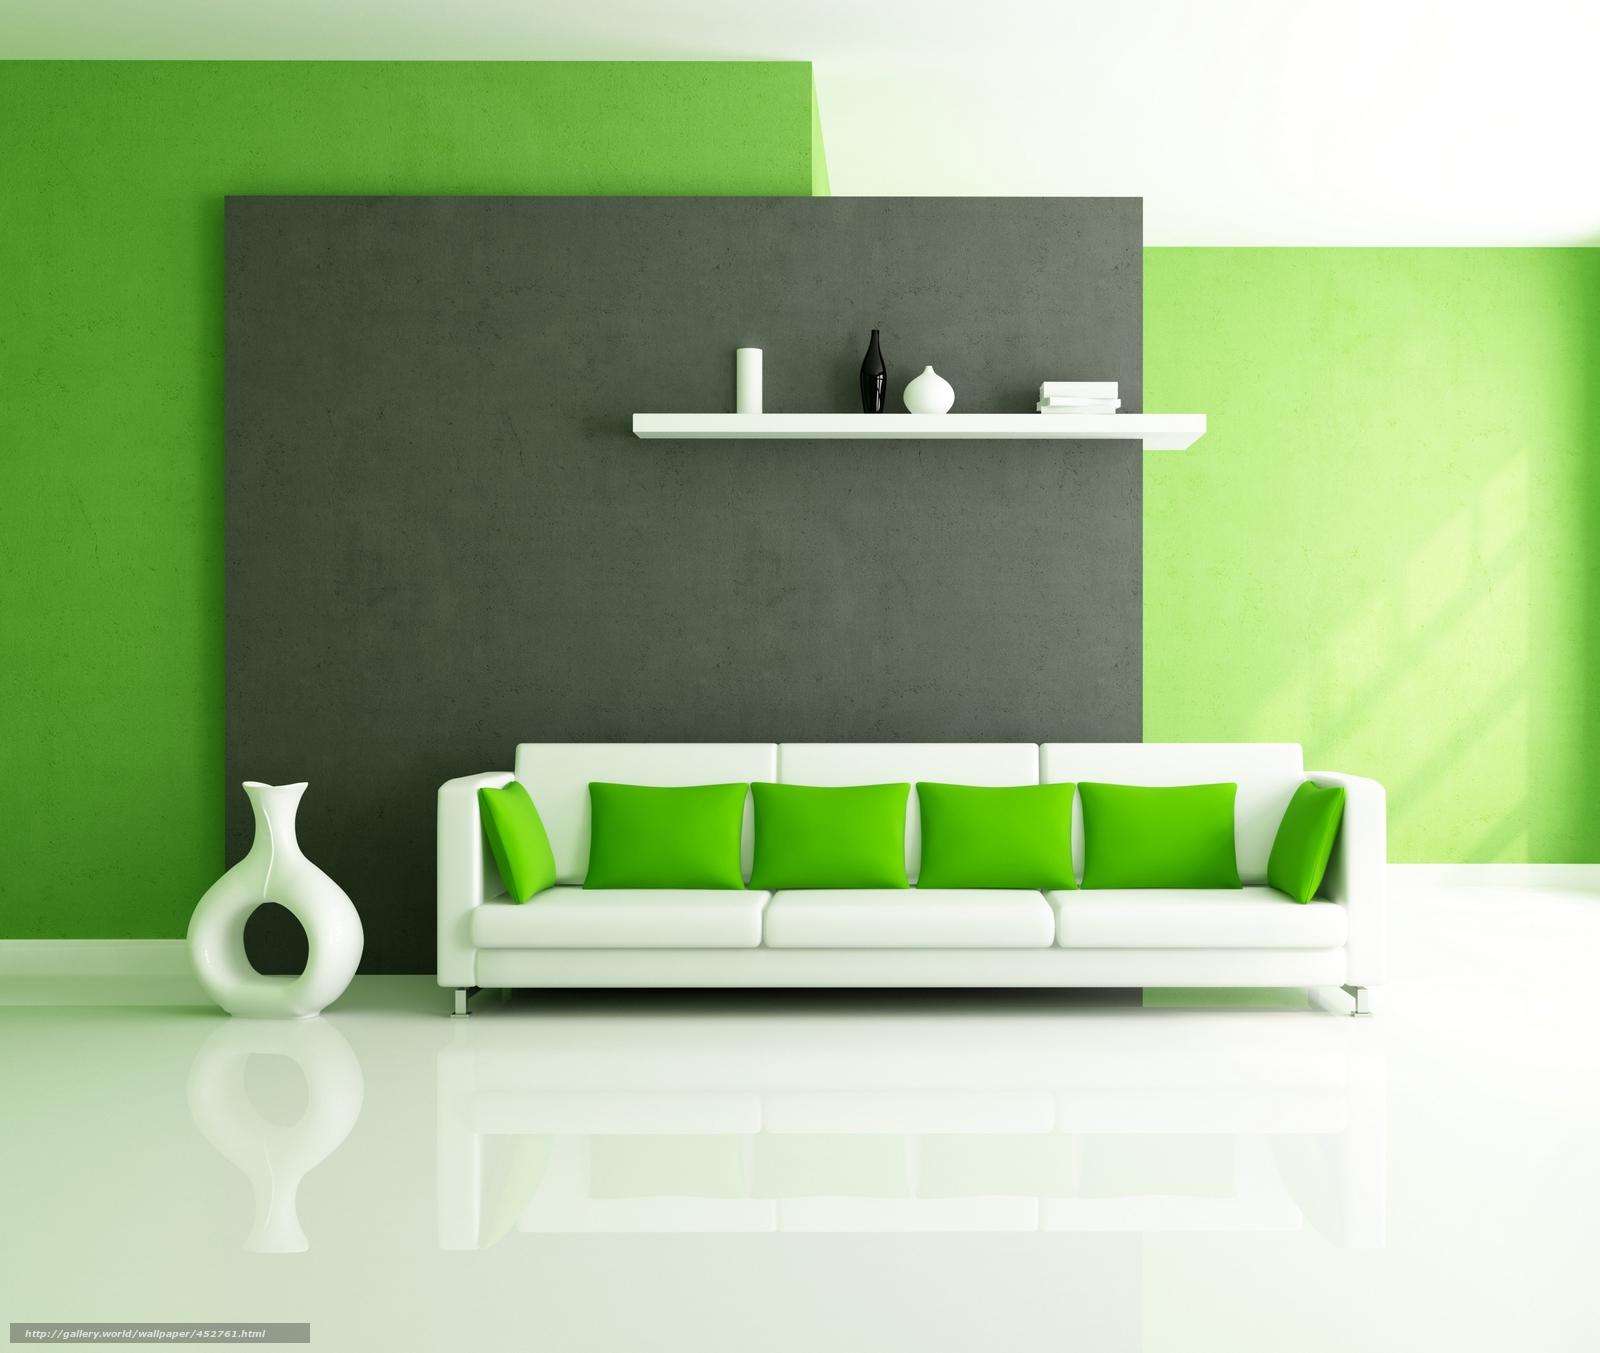 Интерьер стиль дизайн белый зеленый